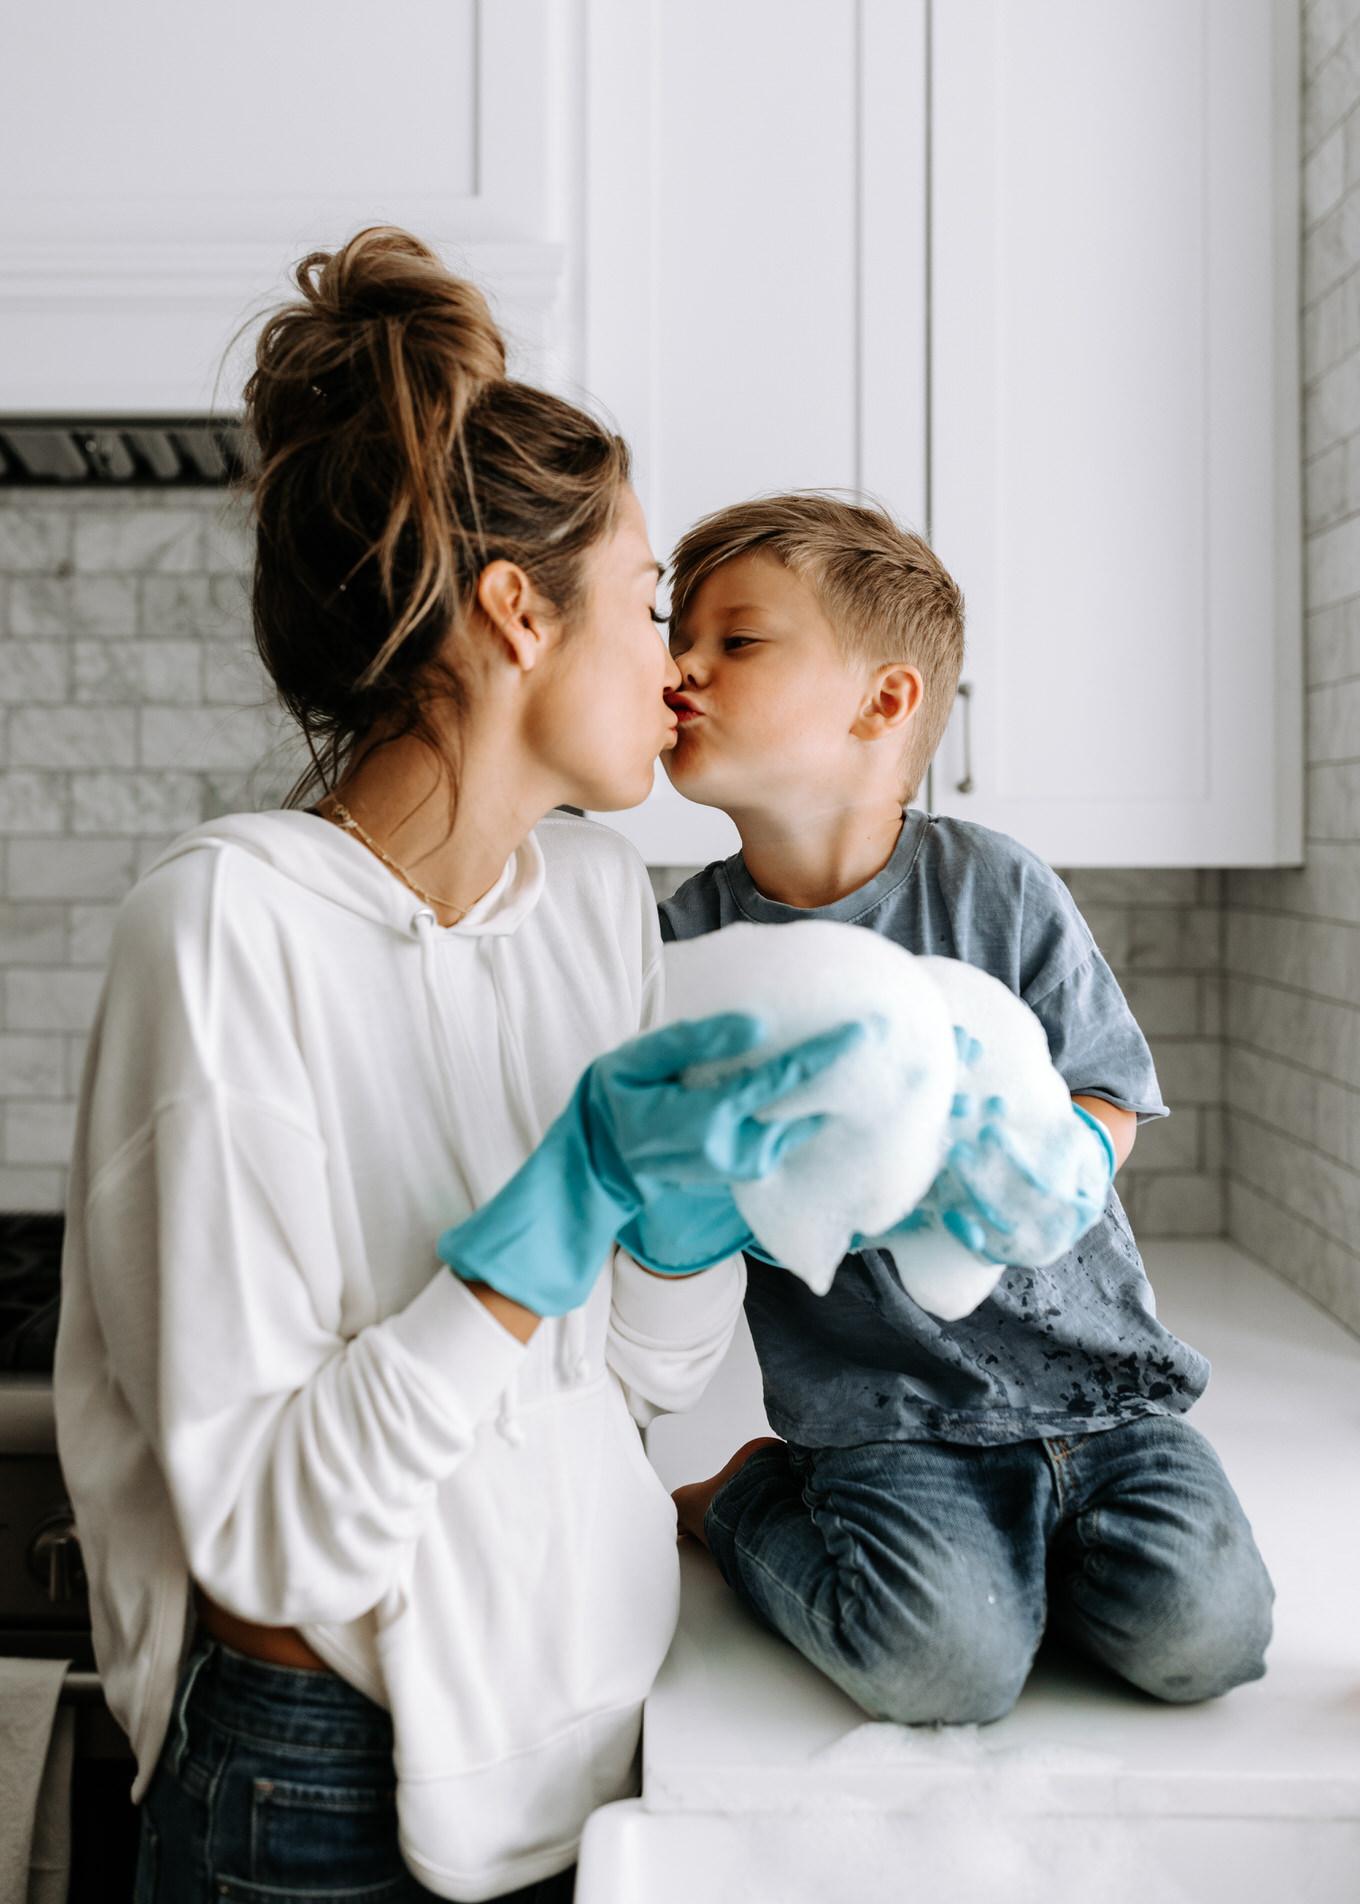 chores for little kids